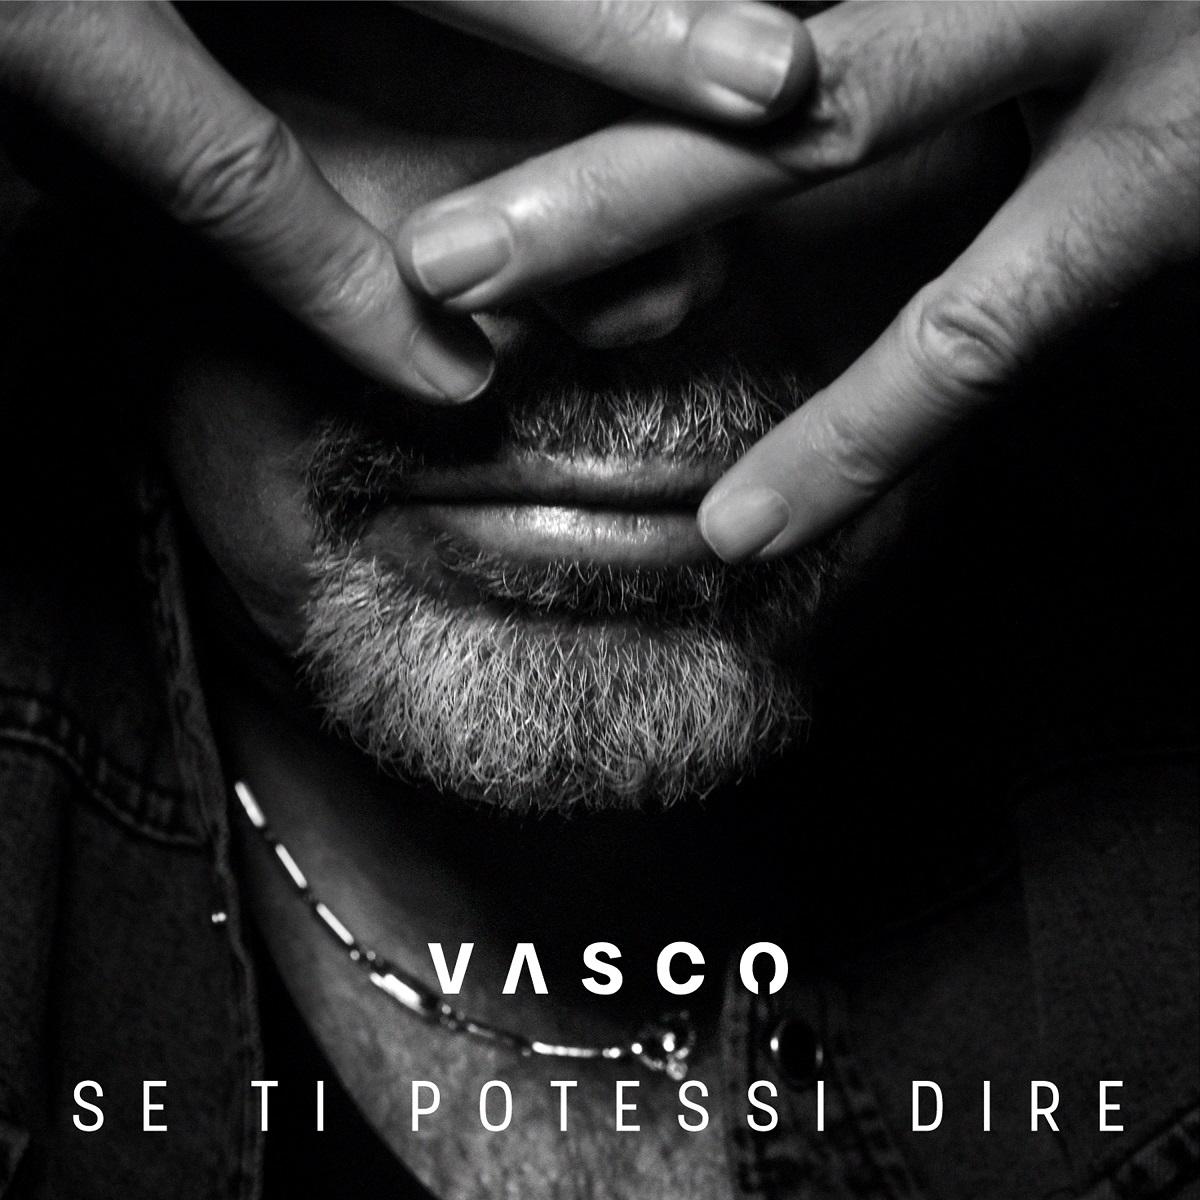 Se ti potessi dire - Vasco Rossi